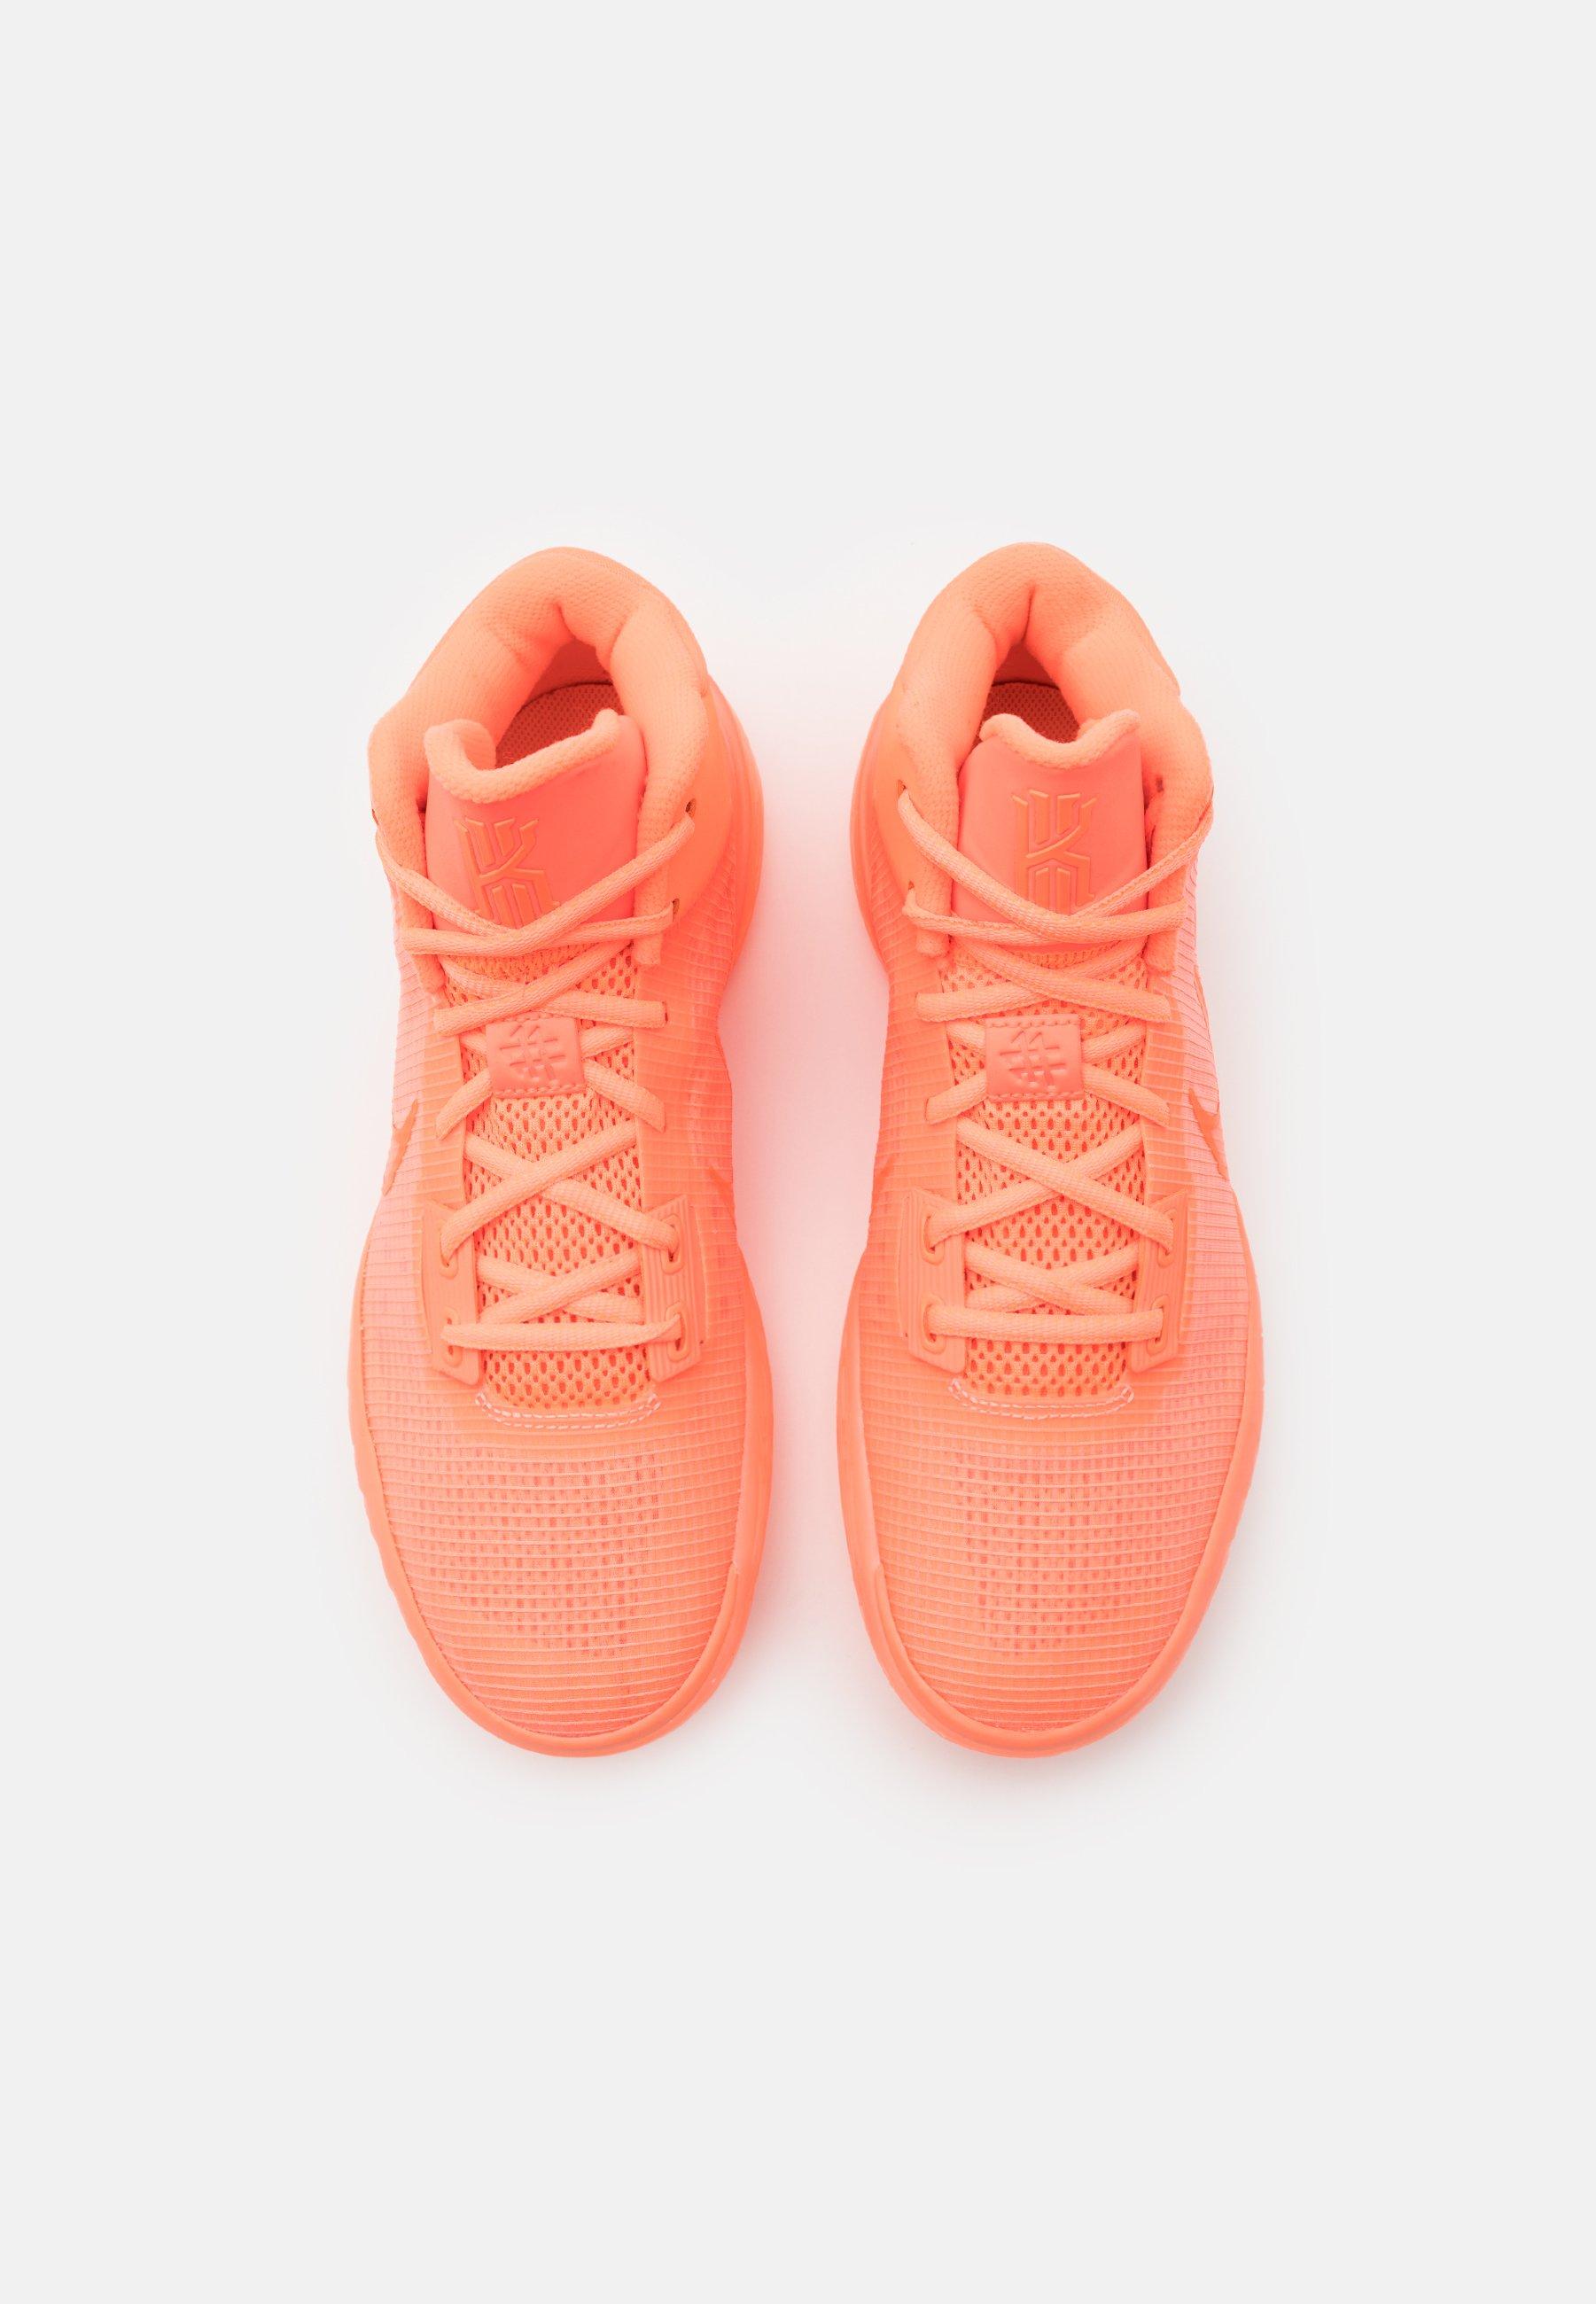 Men KYRIE FLYTRAP 4 - Basketball shoes